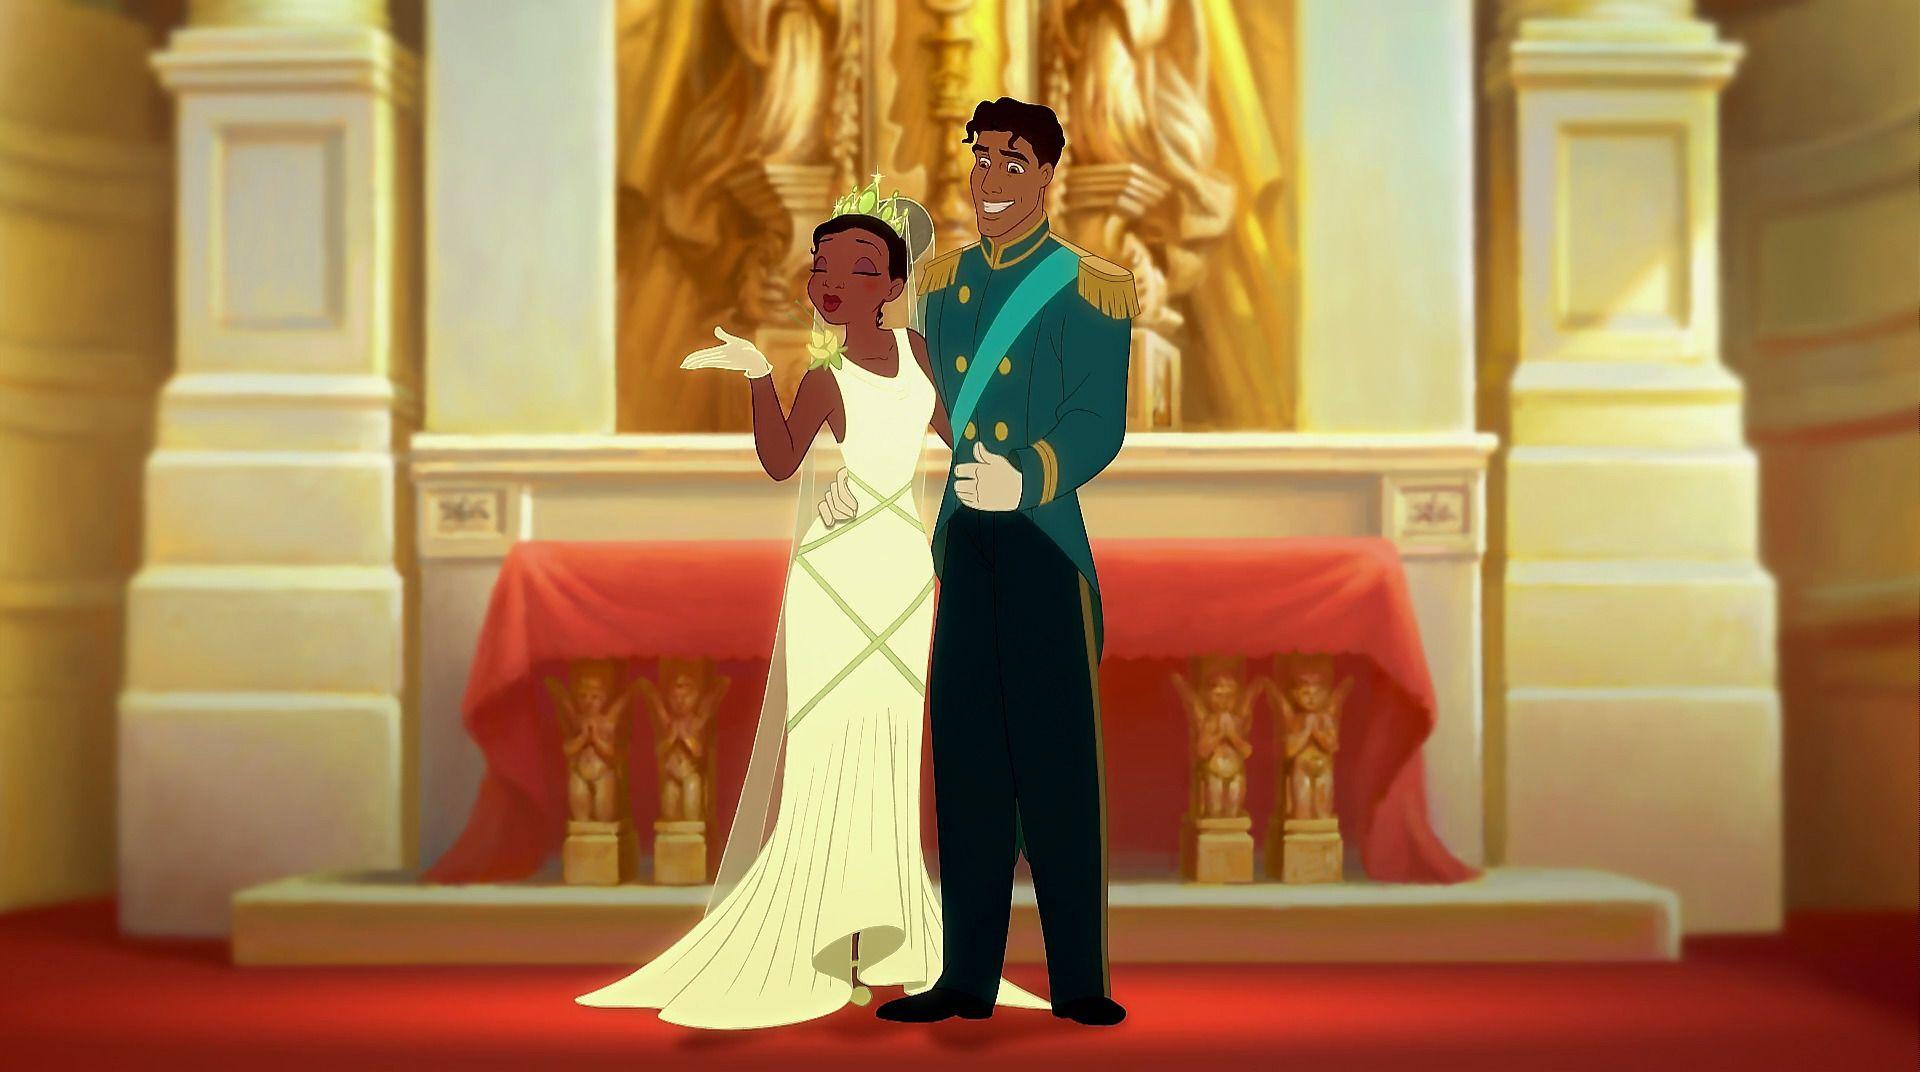 The Princess and the Frog (2009) Disney Screencaps